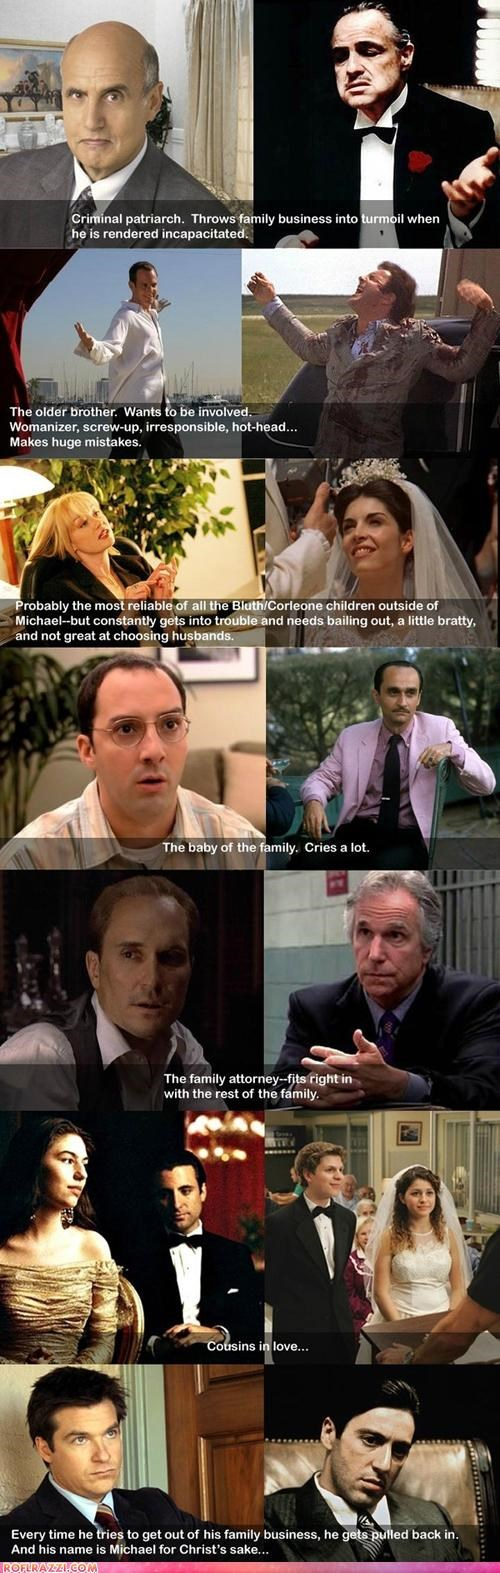 arrested development,comparison,formula,funny,Hall of Fame,the godfather